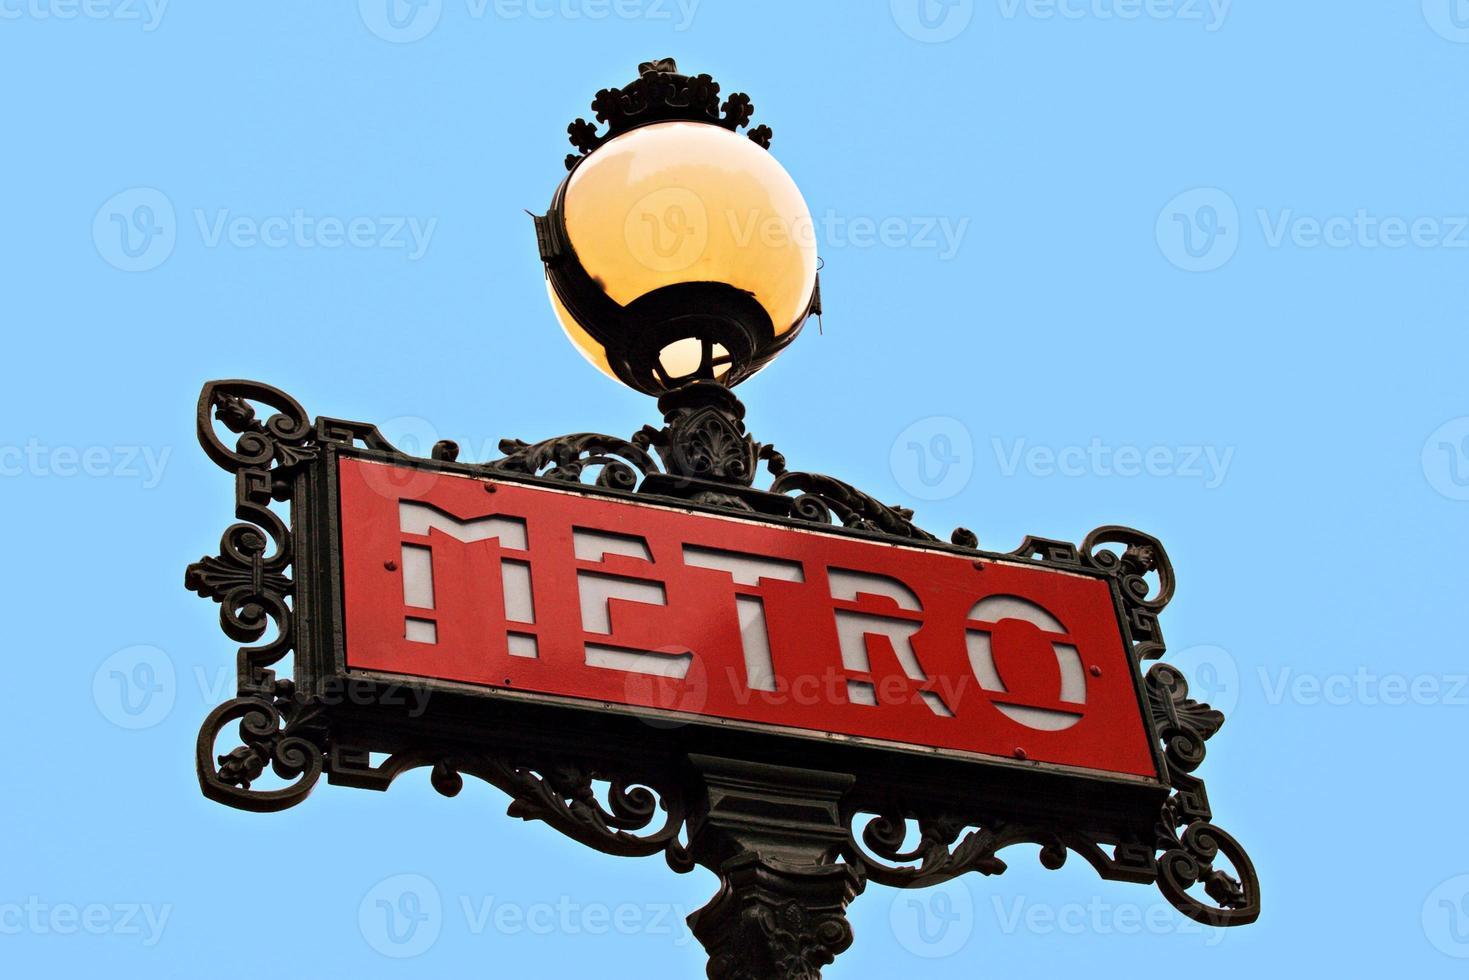 Parisian metro sign photo